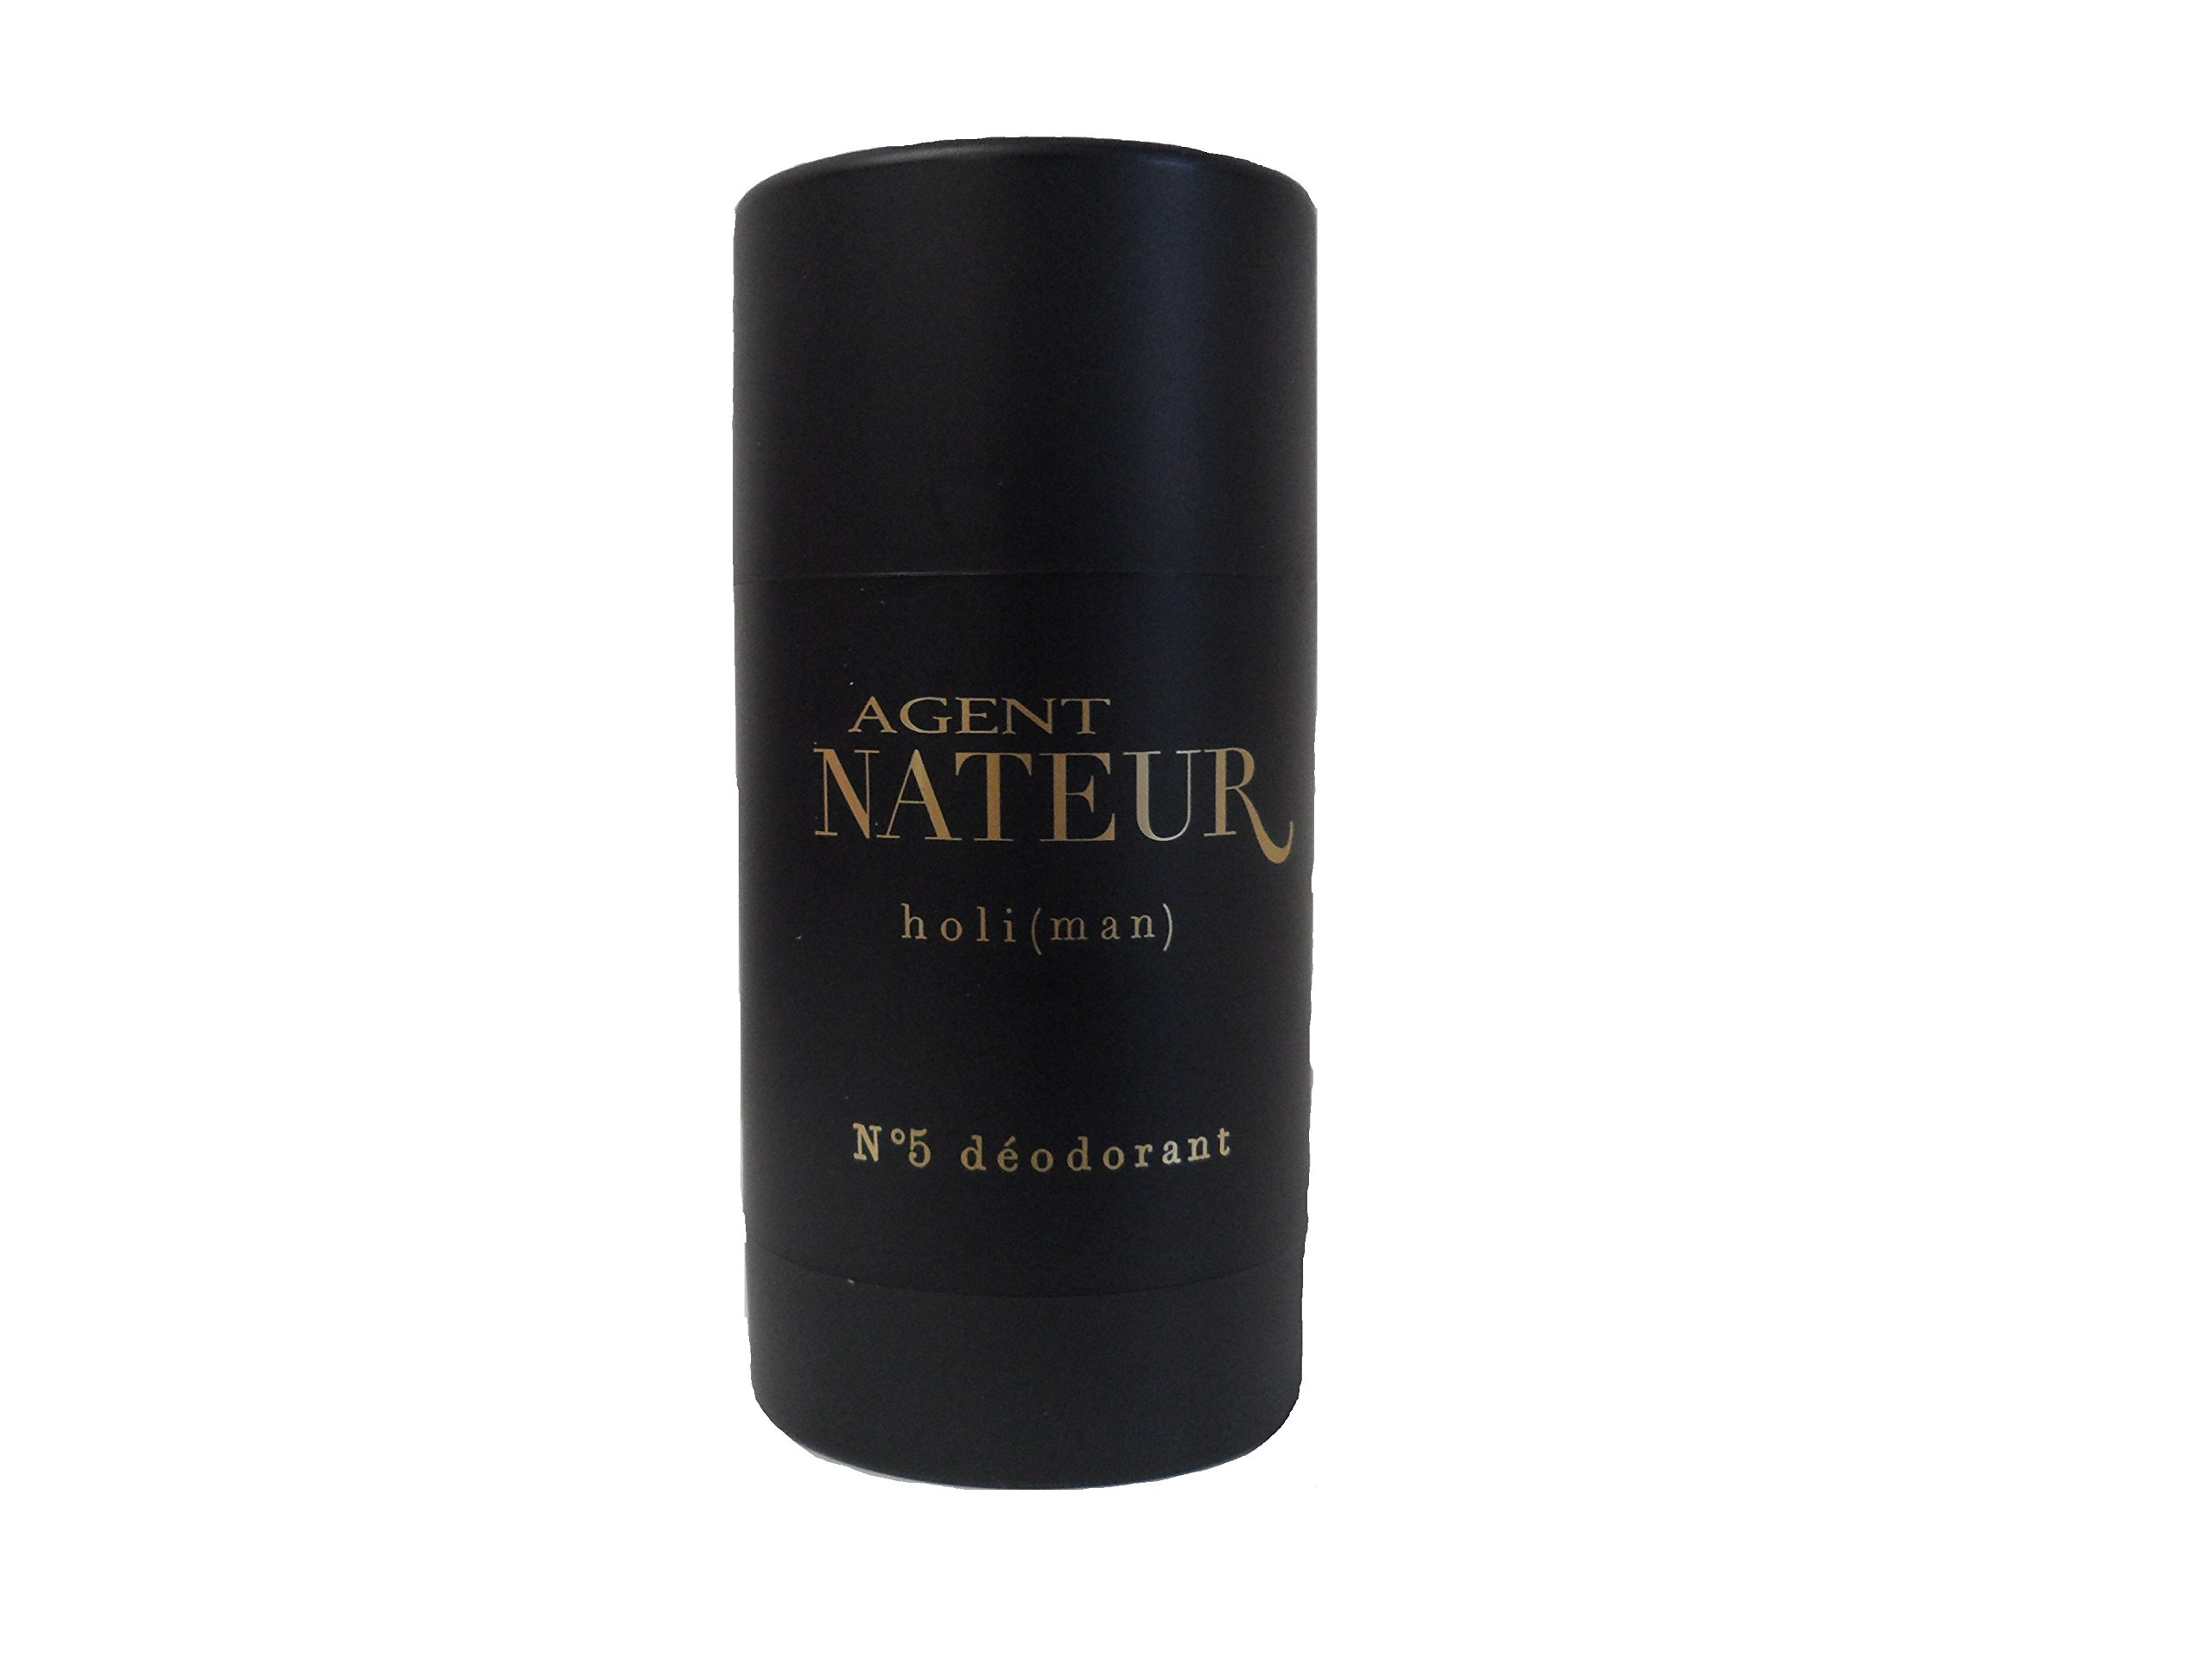 Agent Nateur Natural Deodorant (holi(man)), 1.7Oz